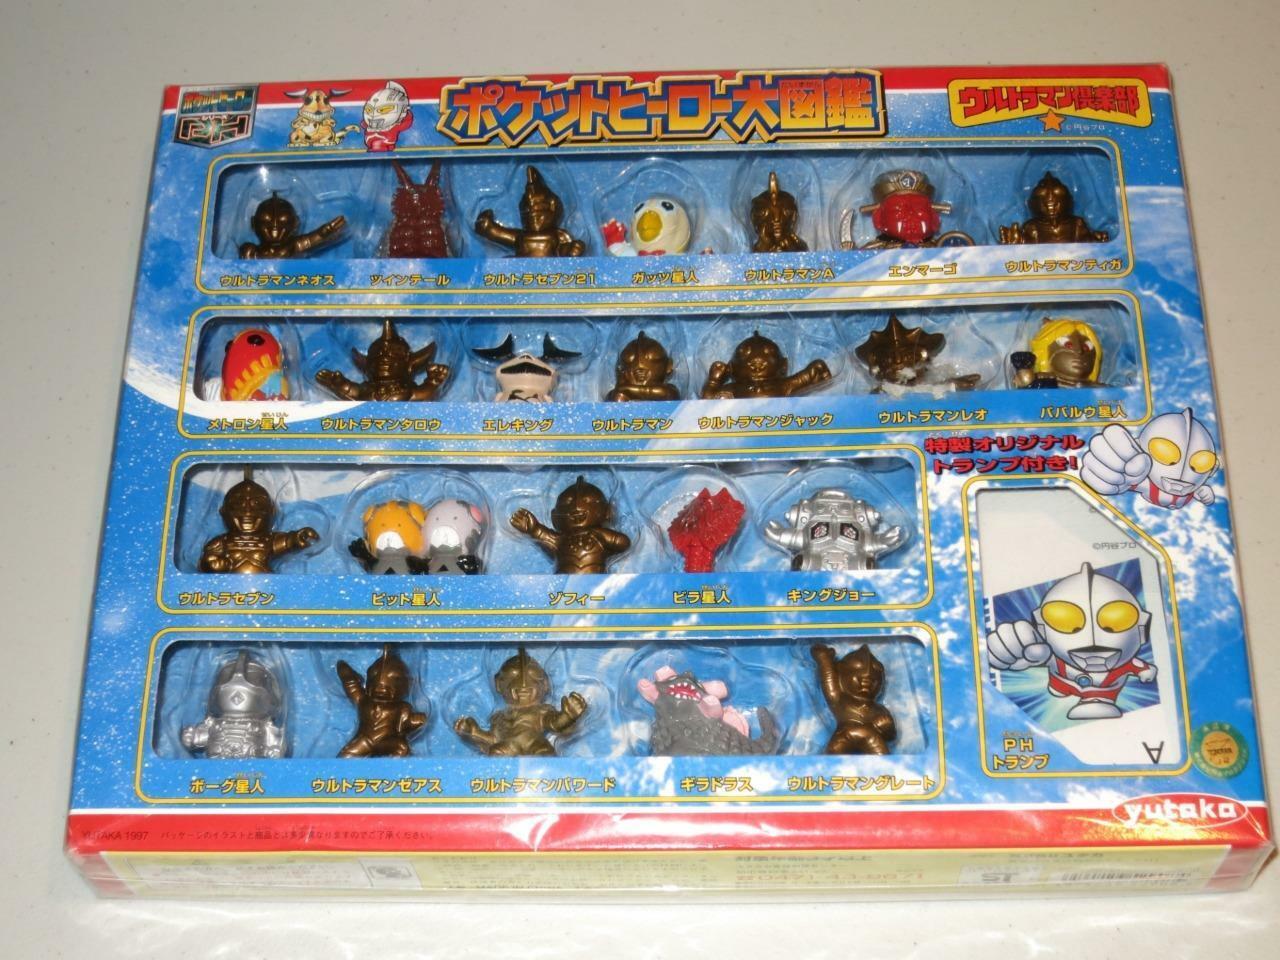 Yutaka Ultraman club Pocket Hero, mini muñeco y nuevo tokusatsu.